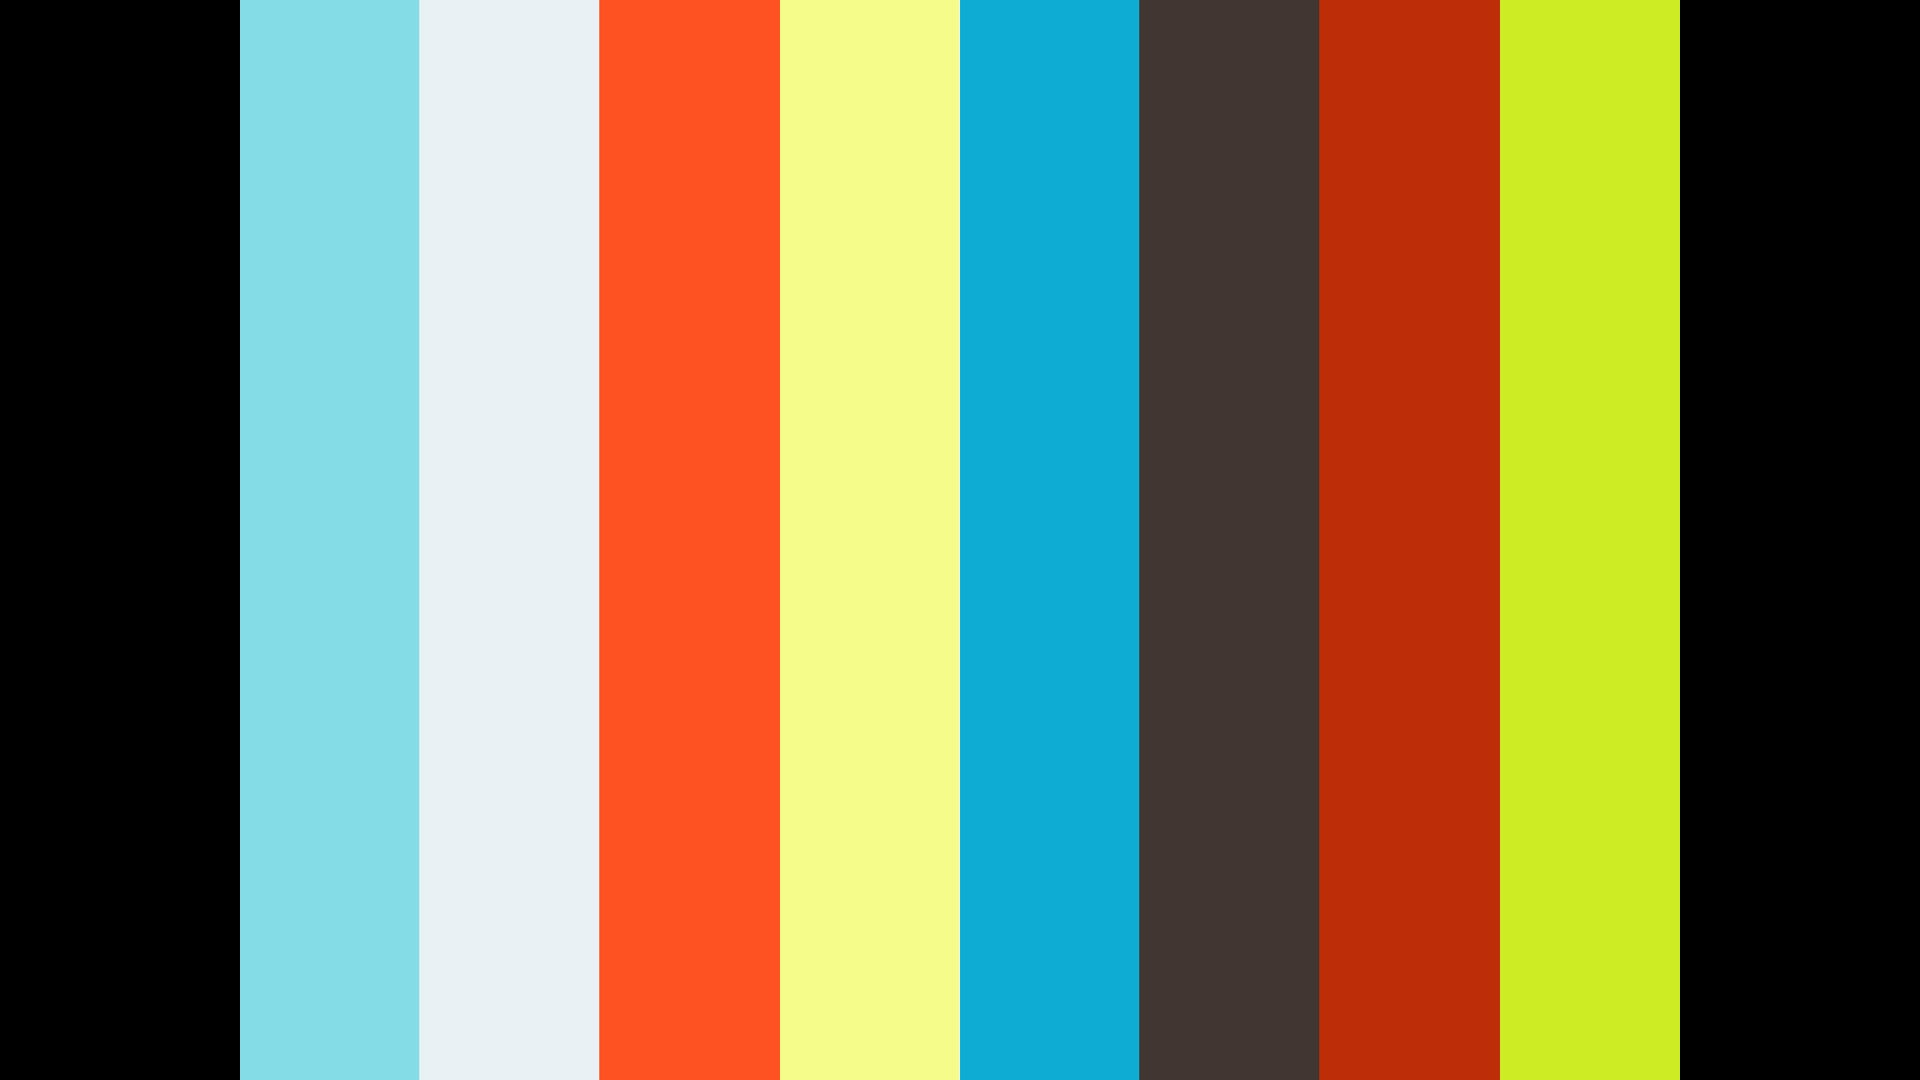 Jazz-on-a-Push Pt3 : Red Clay (Freddie Hubbard) by QB Smith